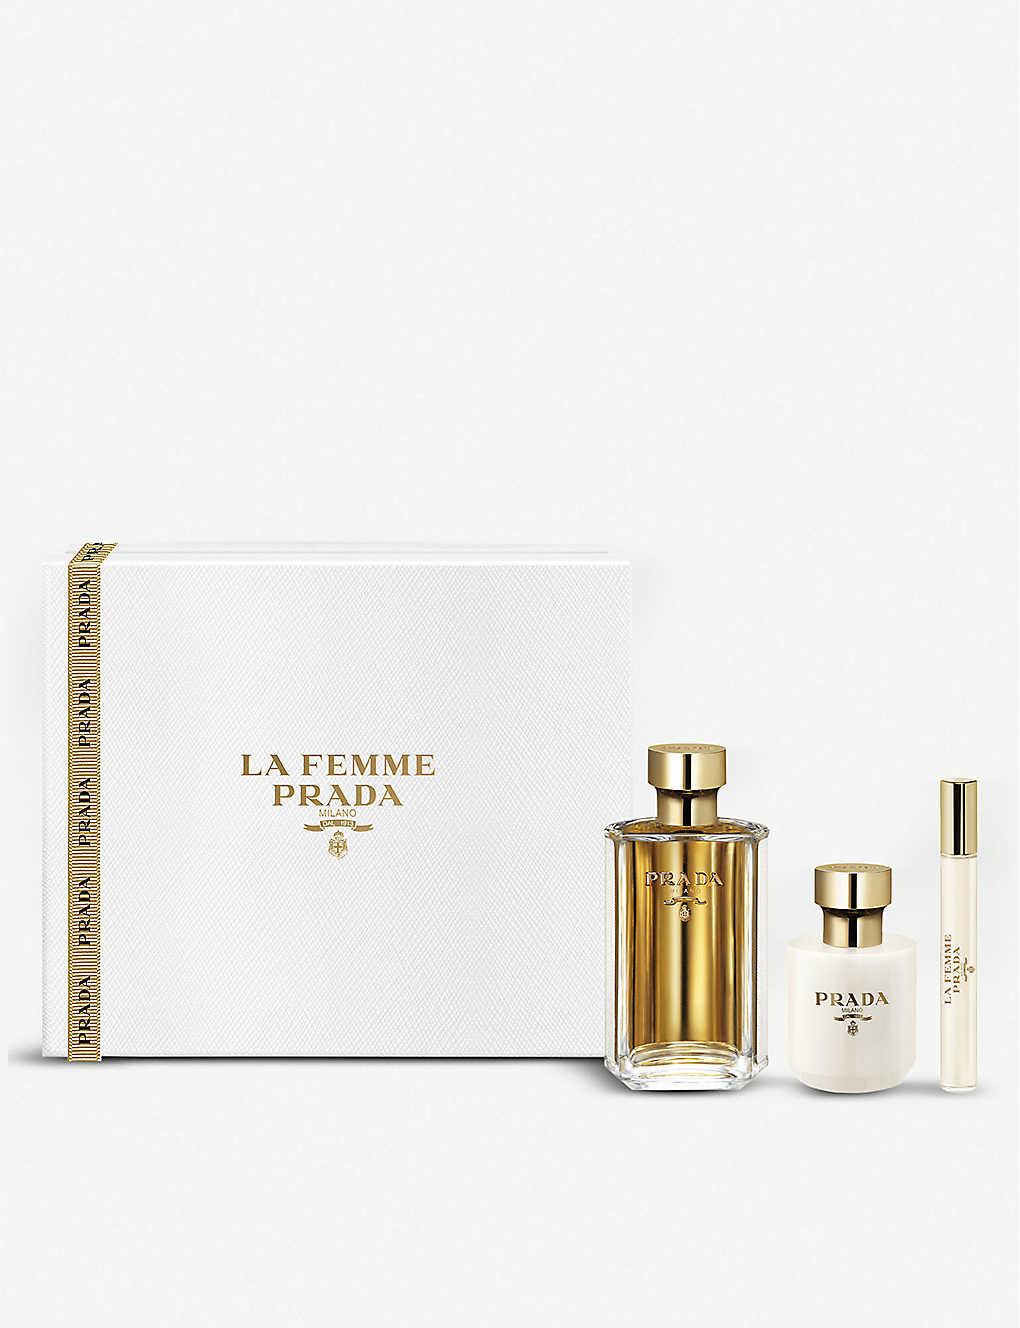 La Femme Prada Women's Fragrance | PRADA